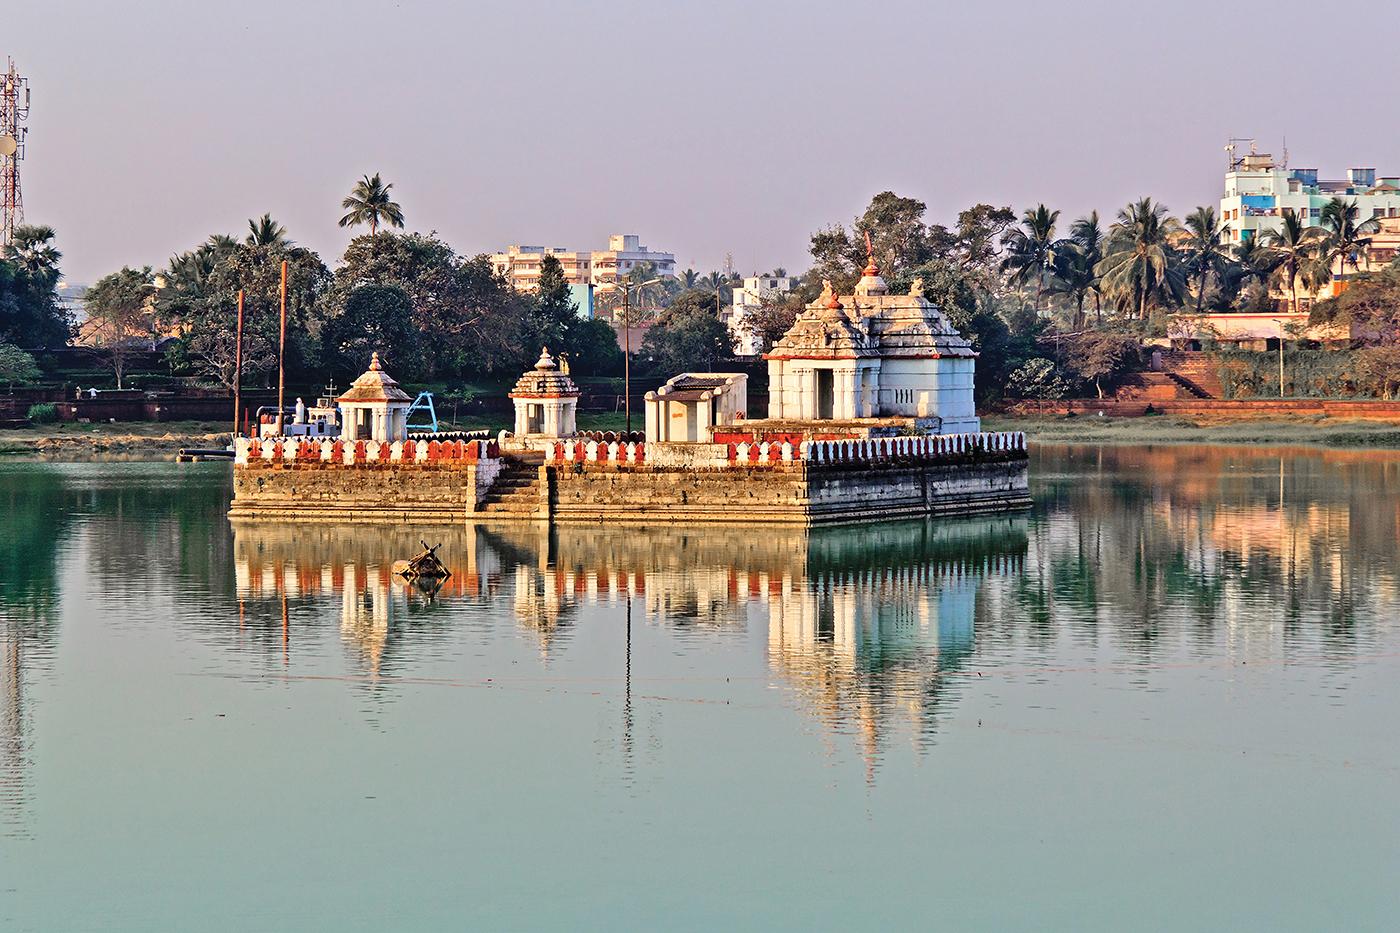 Regional Focus Bhubaneshwar